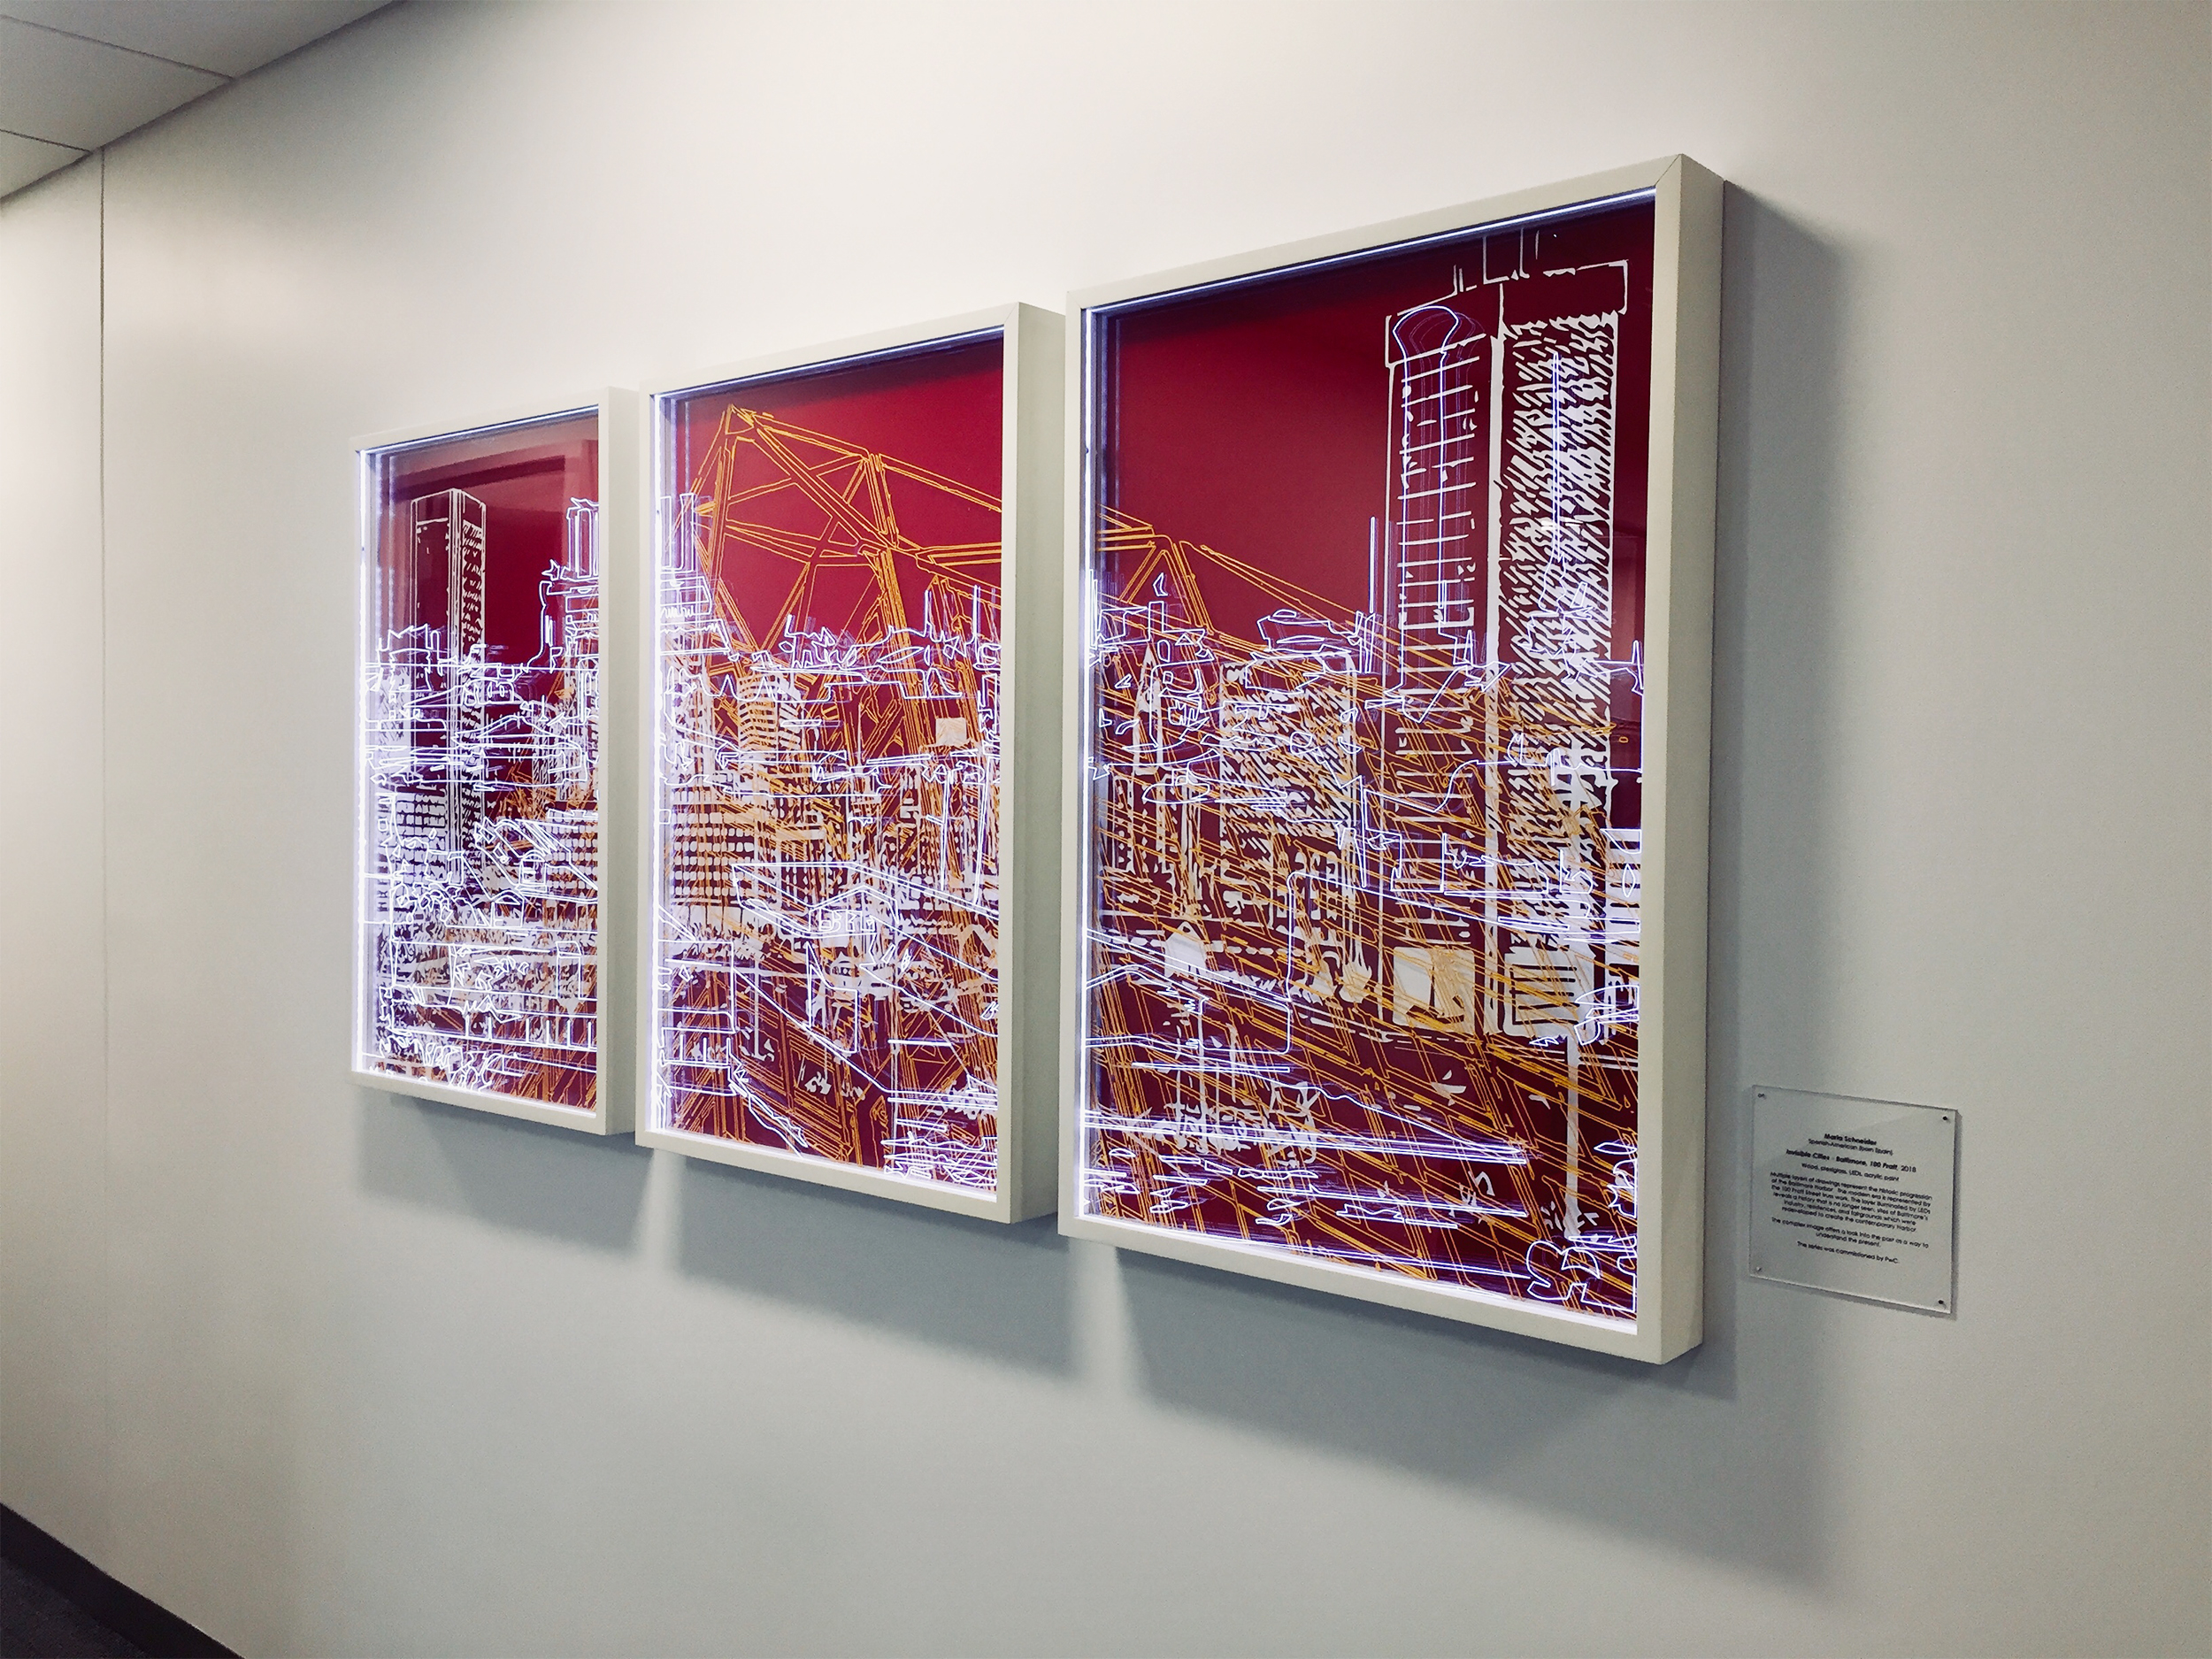 Invisible Cities- Baltimore, 100 Pratt